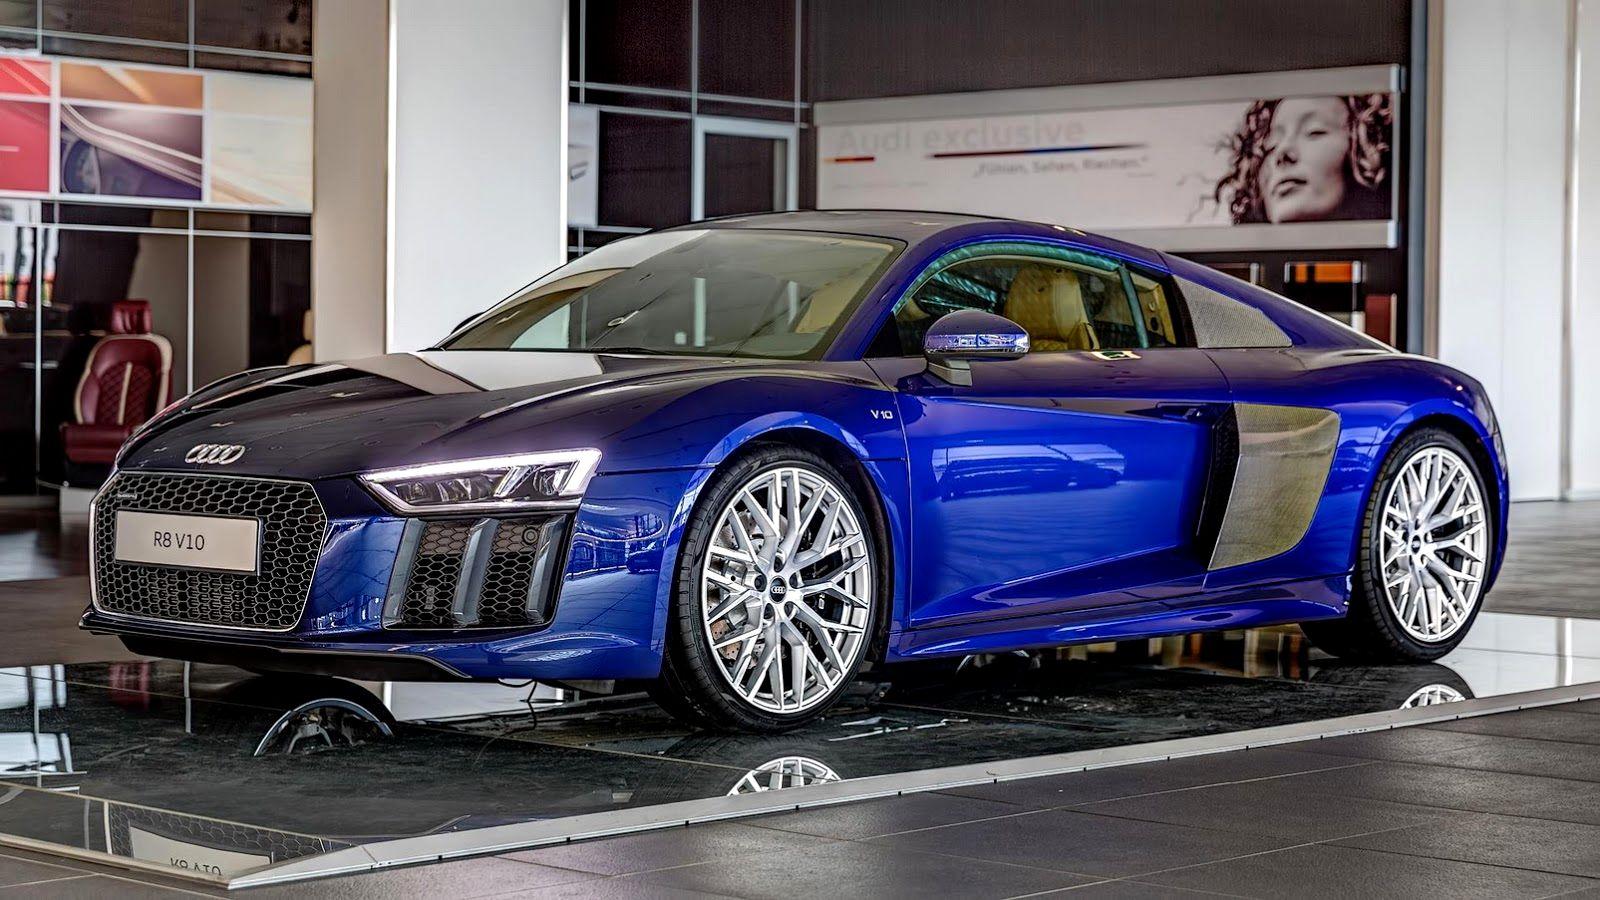 Kelebihan Audi V8 Turbo Harga